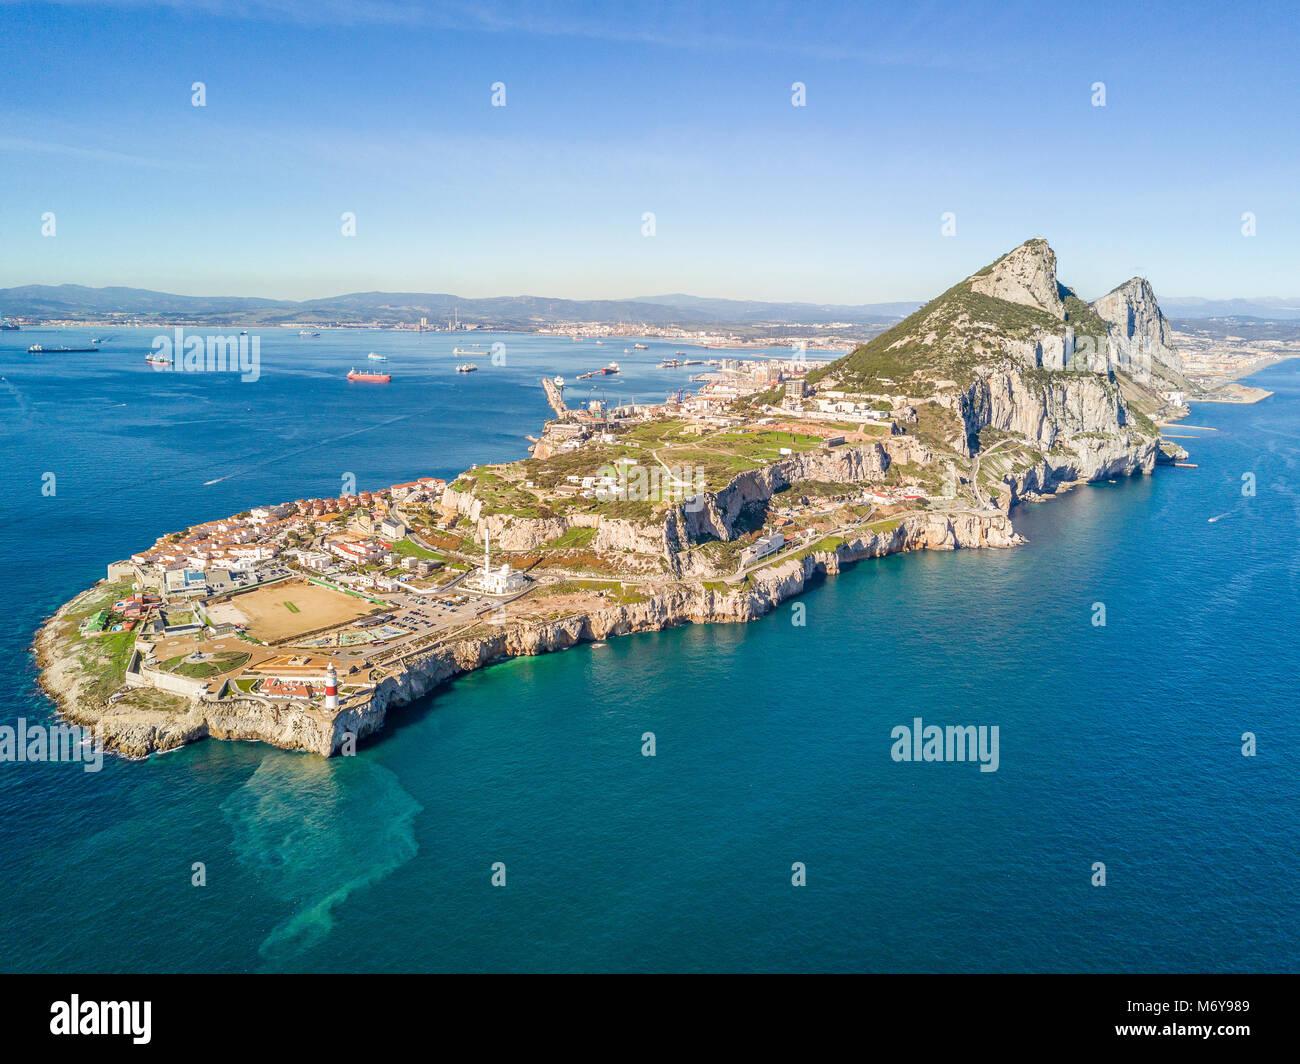 Famous Gibraltar rock on overseas british territory, Gibraltar, Iberian Peninsula, Europe - Stock Image